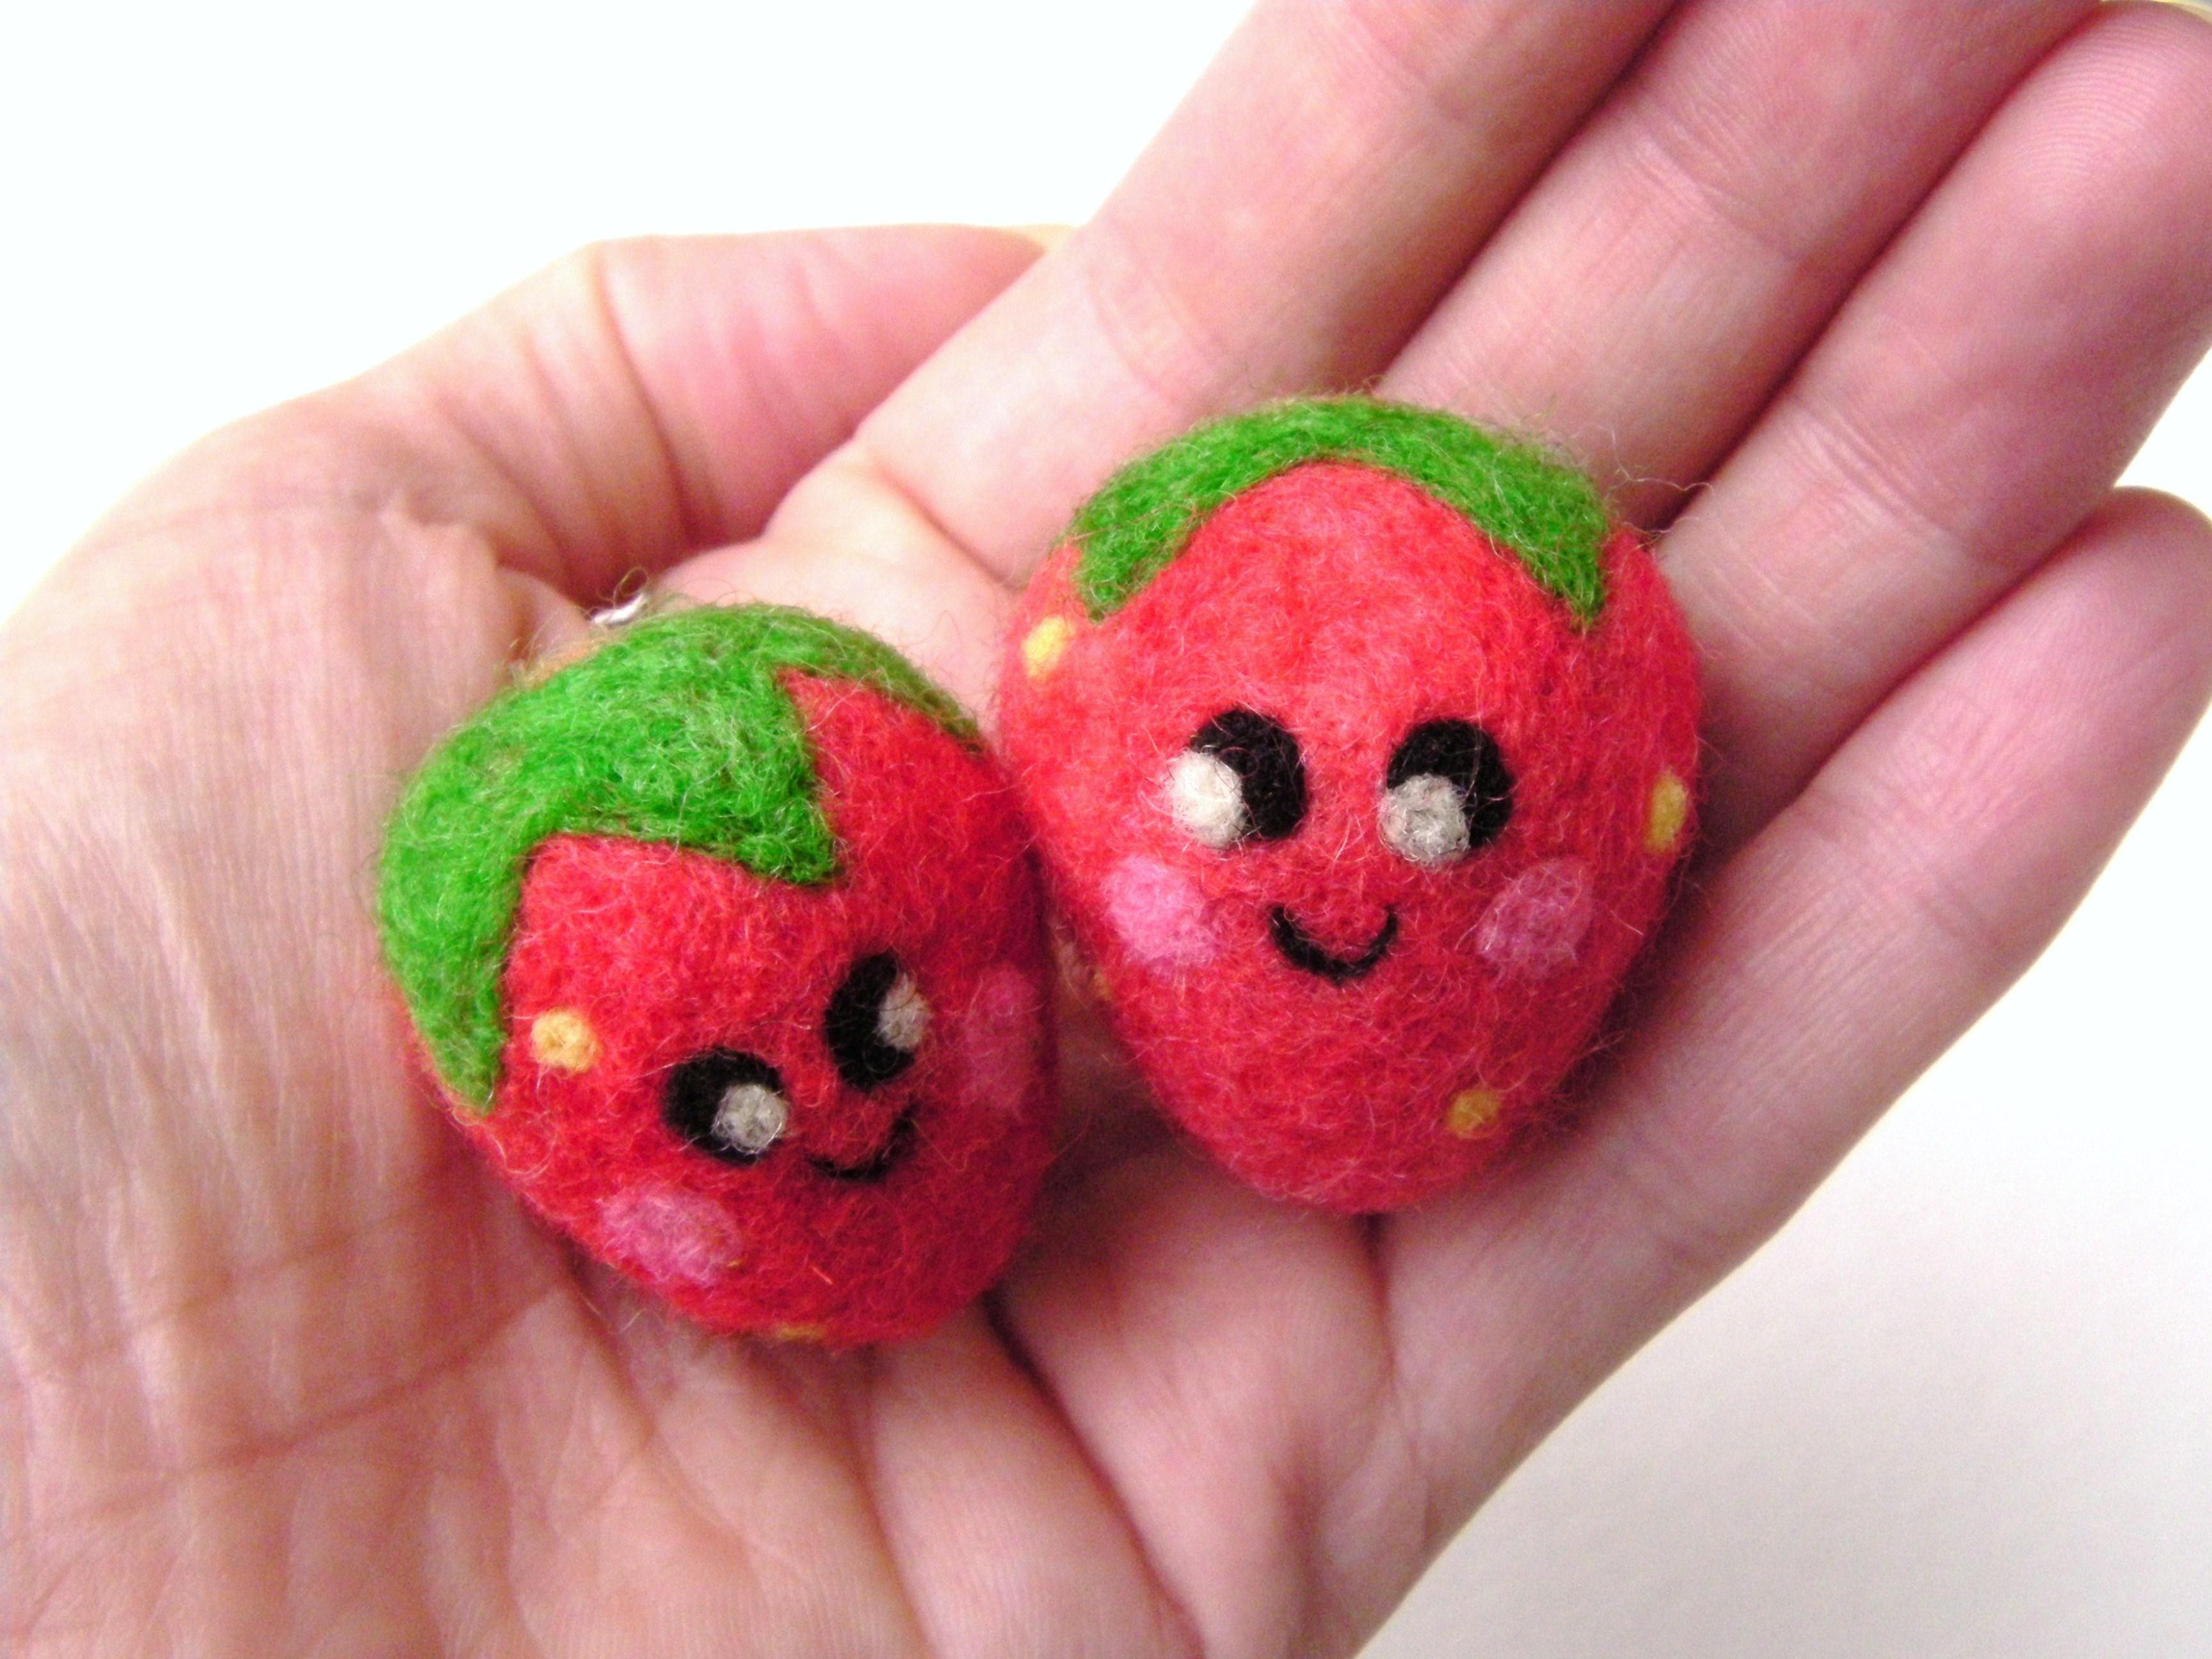 strawberry needles - photo #45